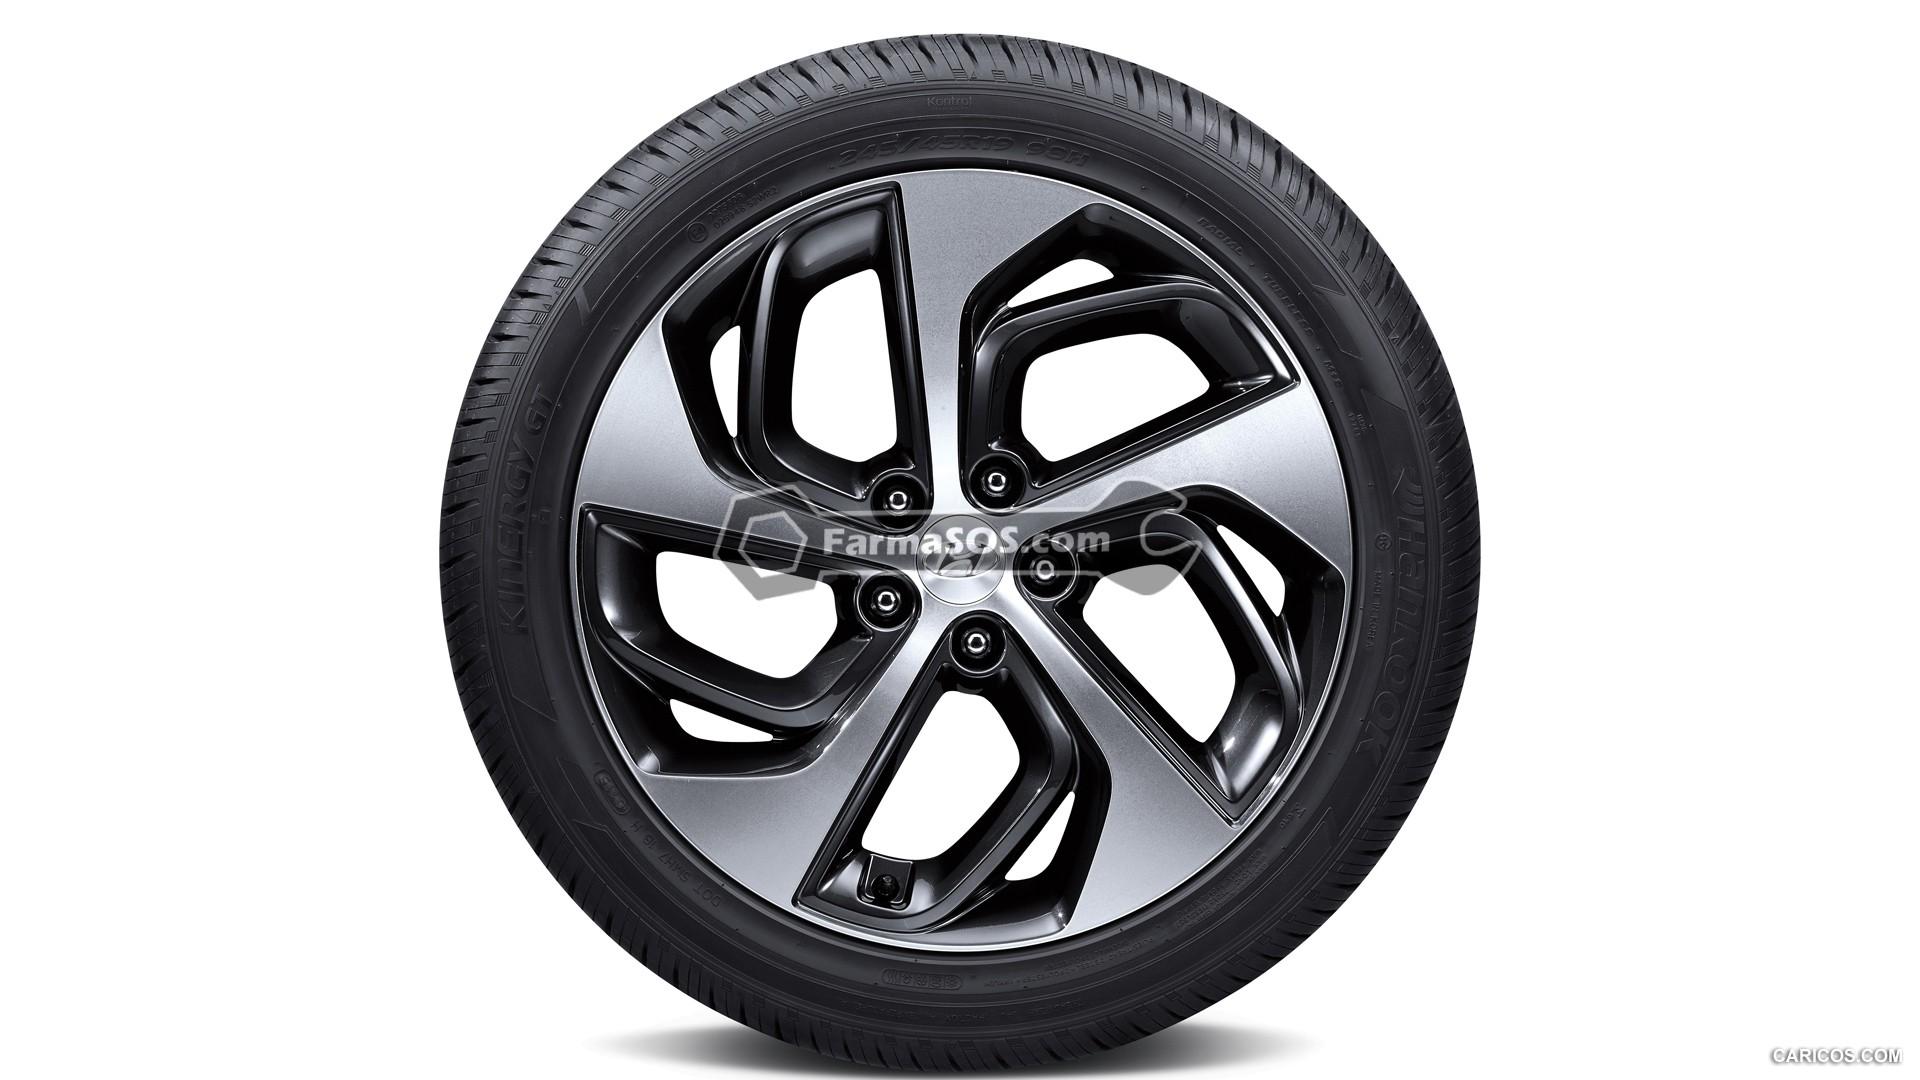 Hyundai Tucson 2015 2017 10 تصاویر هیوندای توسان مدل 2016 تا 2018